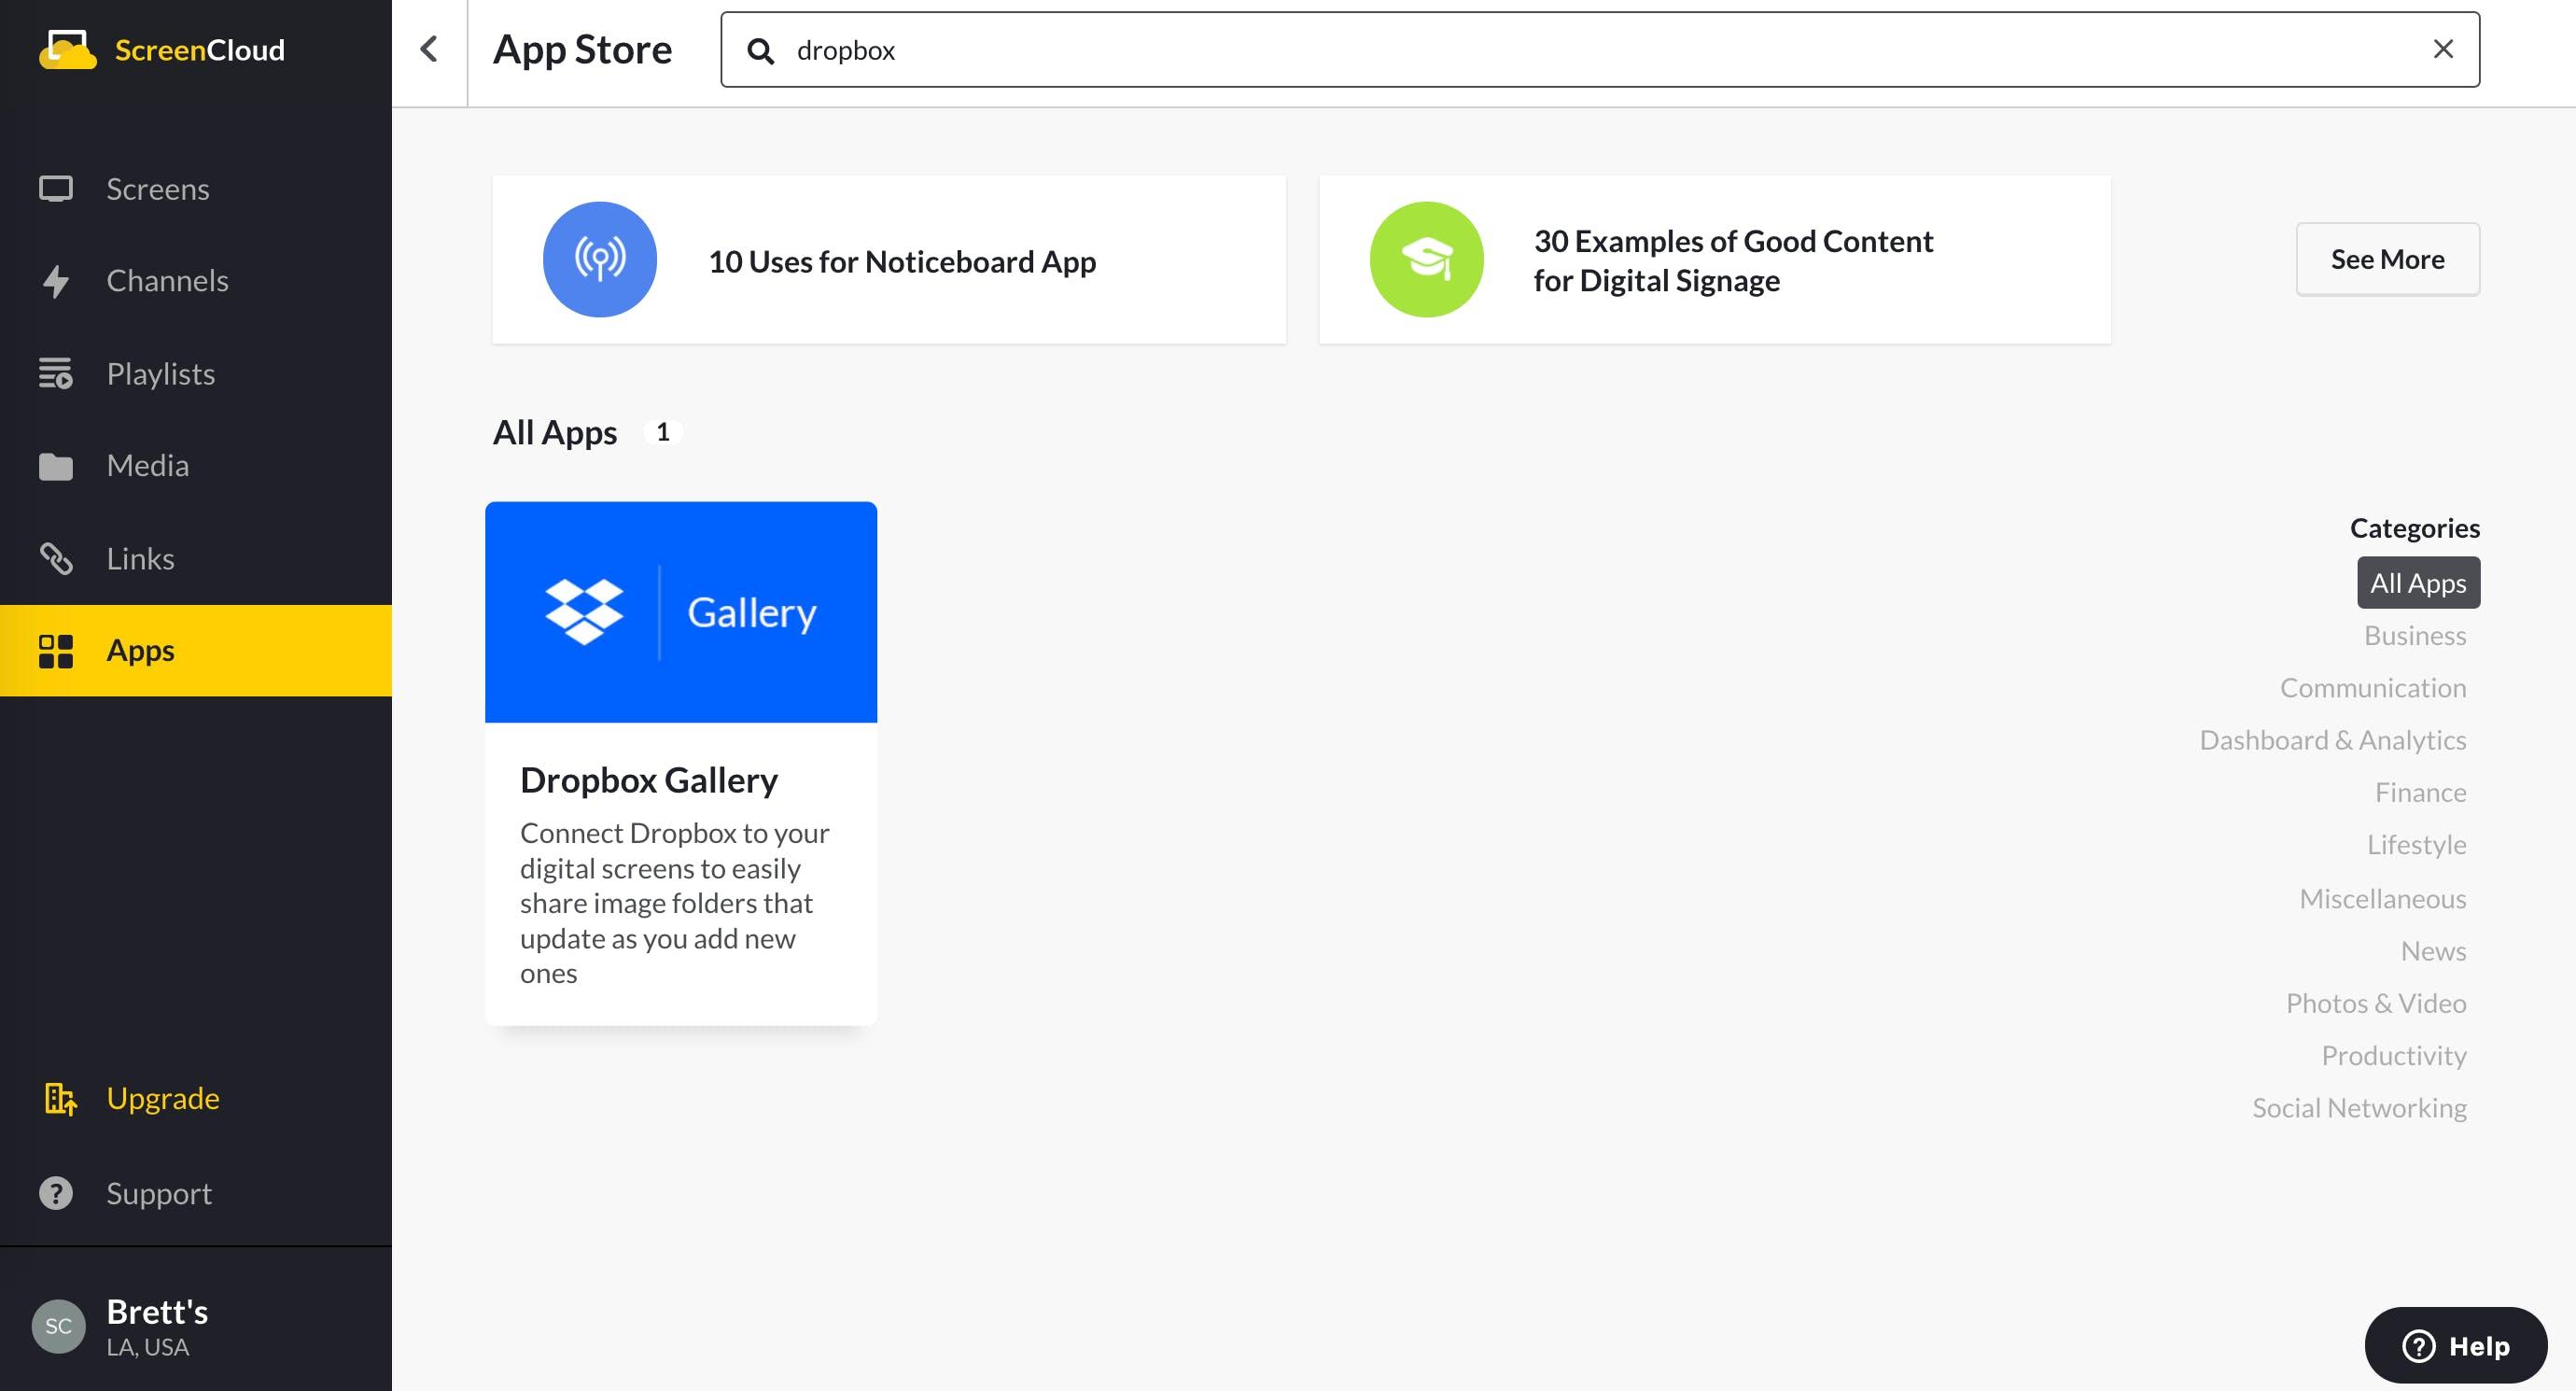 DropBox Gallery App Guide - App Store 5.13.2020.png